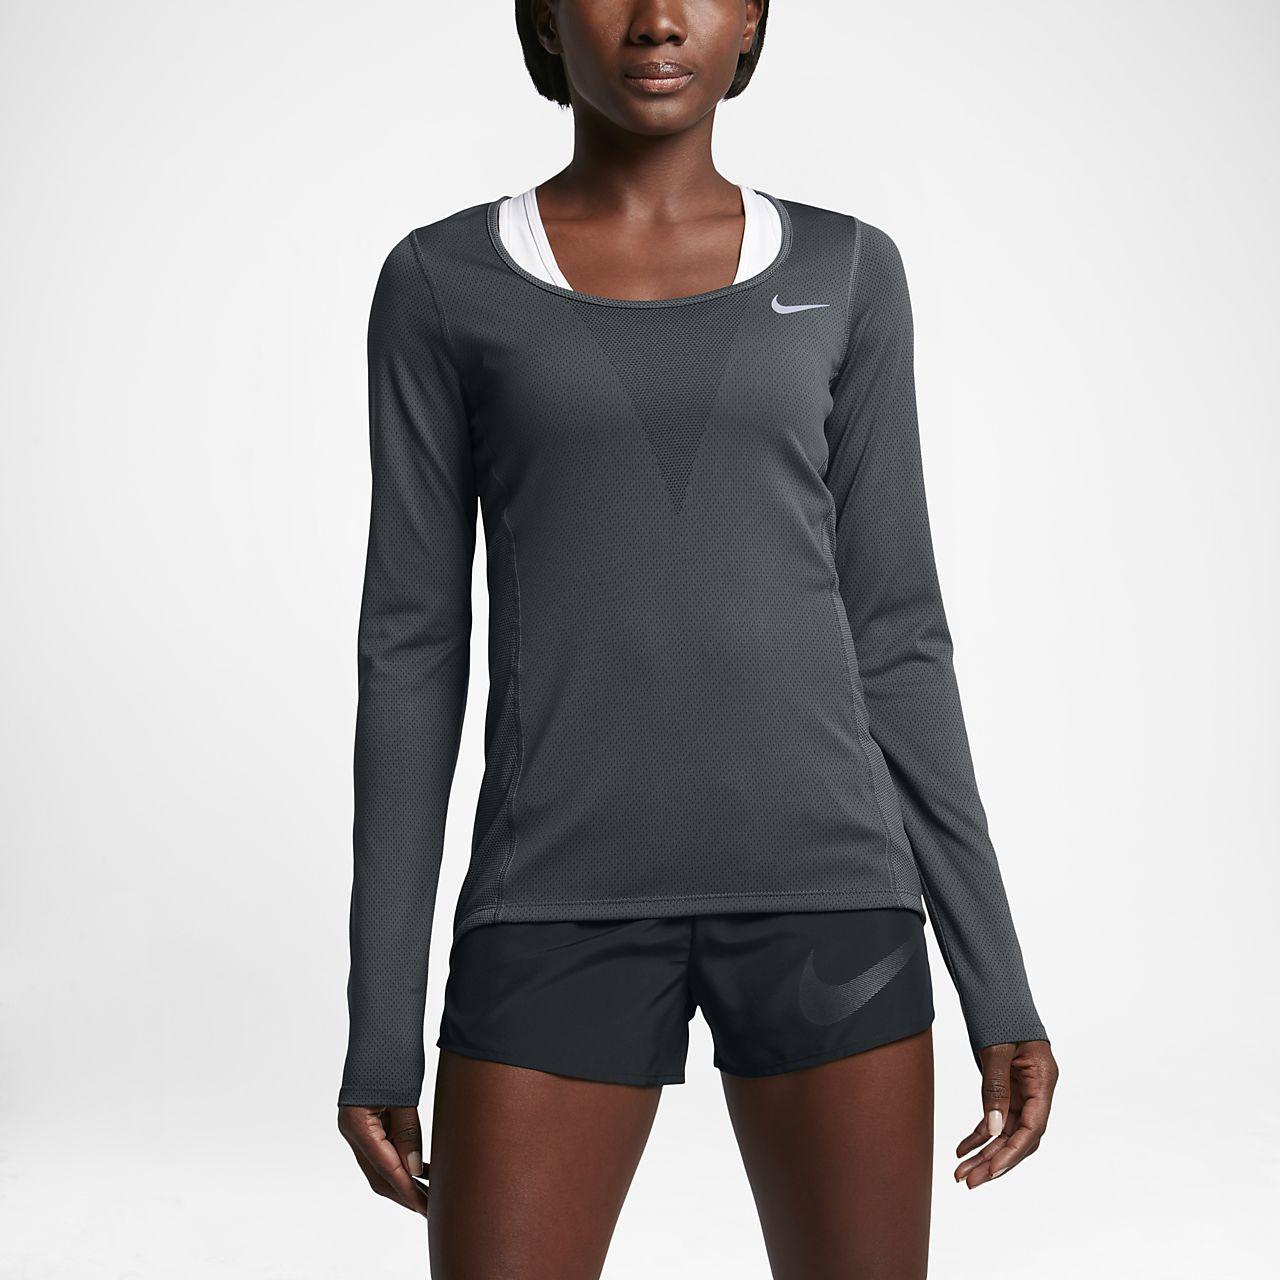 ... Nike Relay Women's Long-Sleeve Running Top